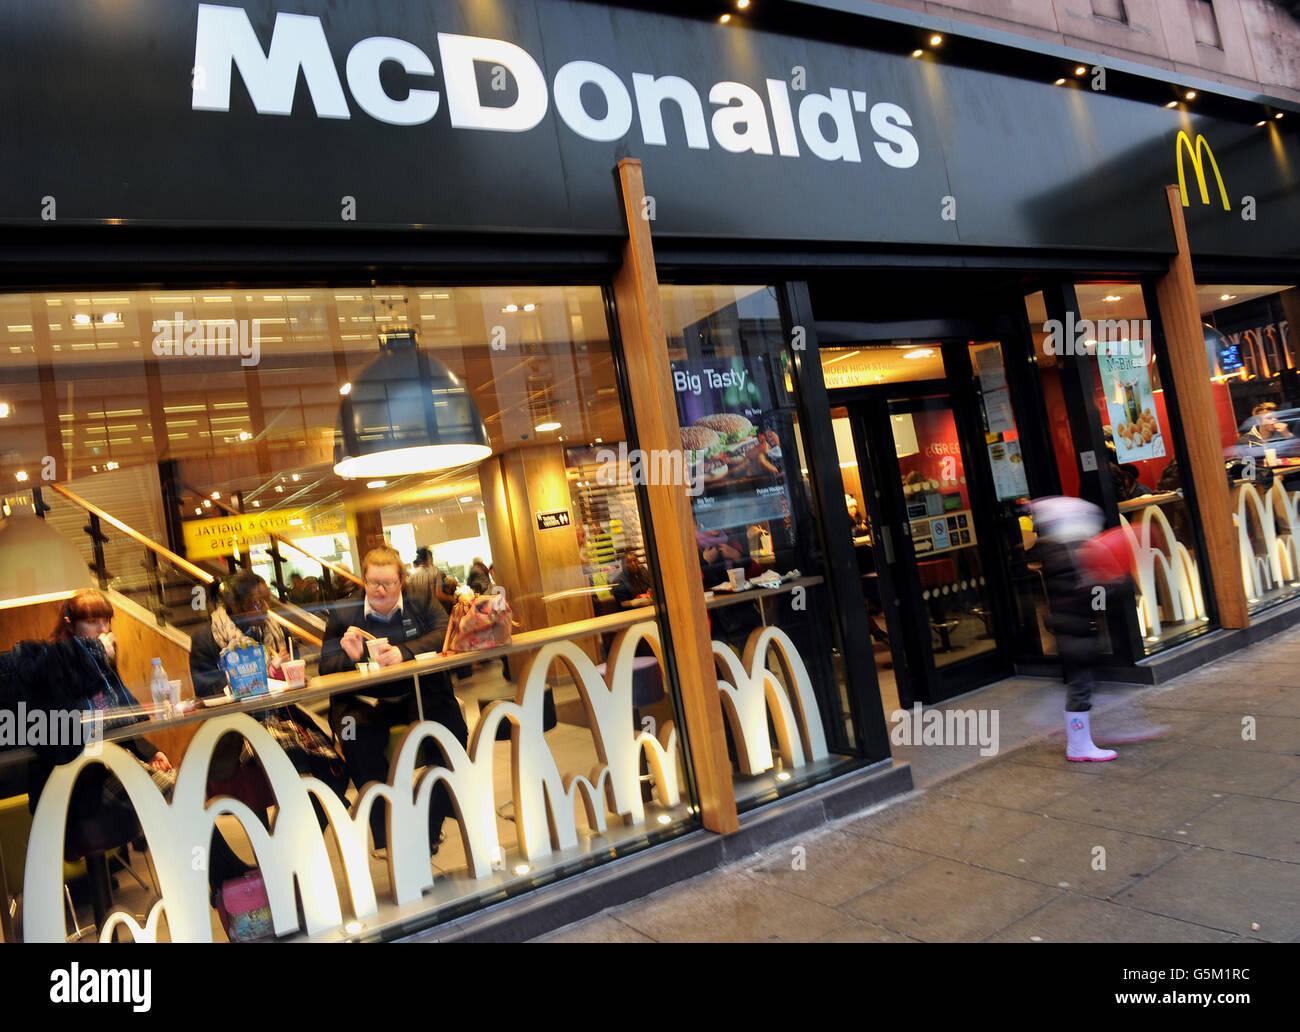 McDonald's jobs Stock Photo: 106775968 - Alamy